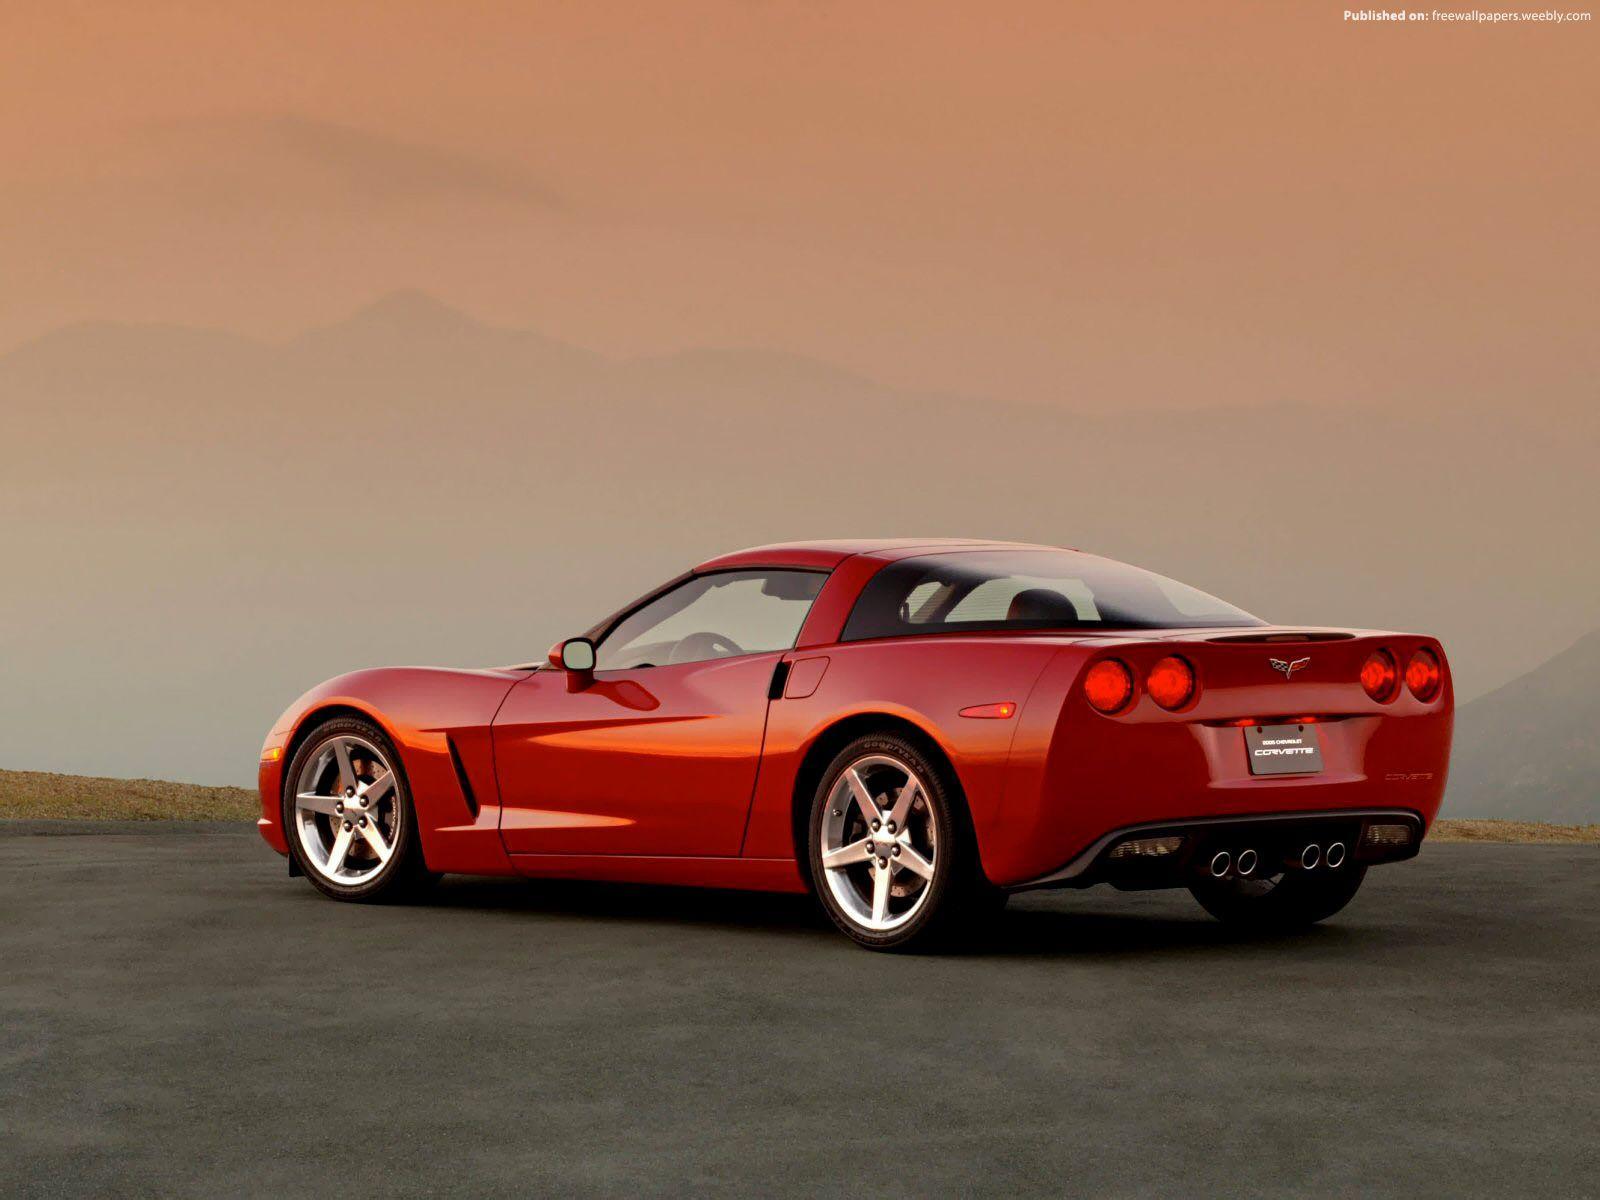 corvette c5 wallpaper viewing gallery - Corvette C5 Logo Wallpaper